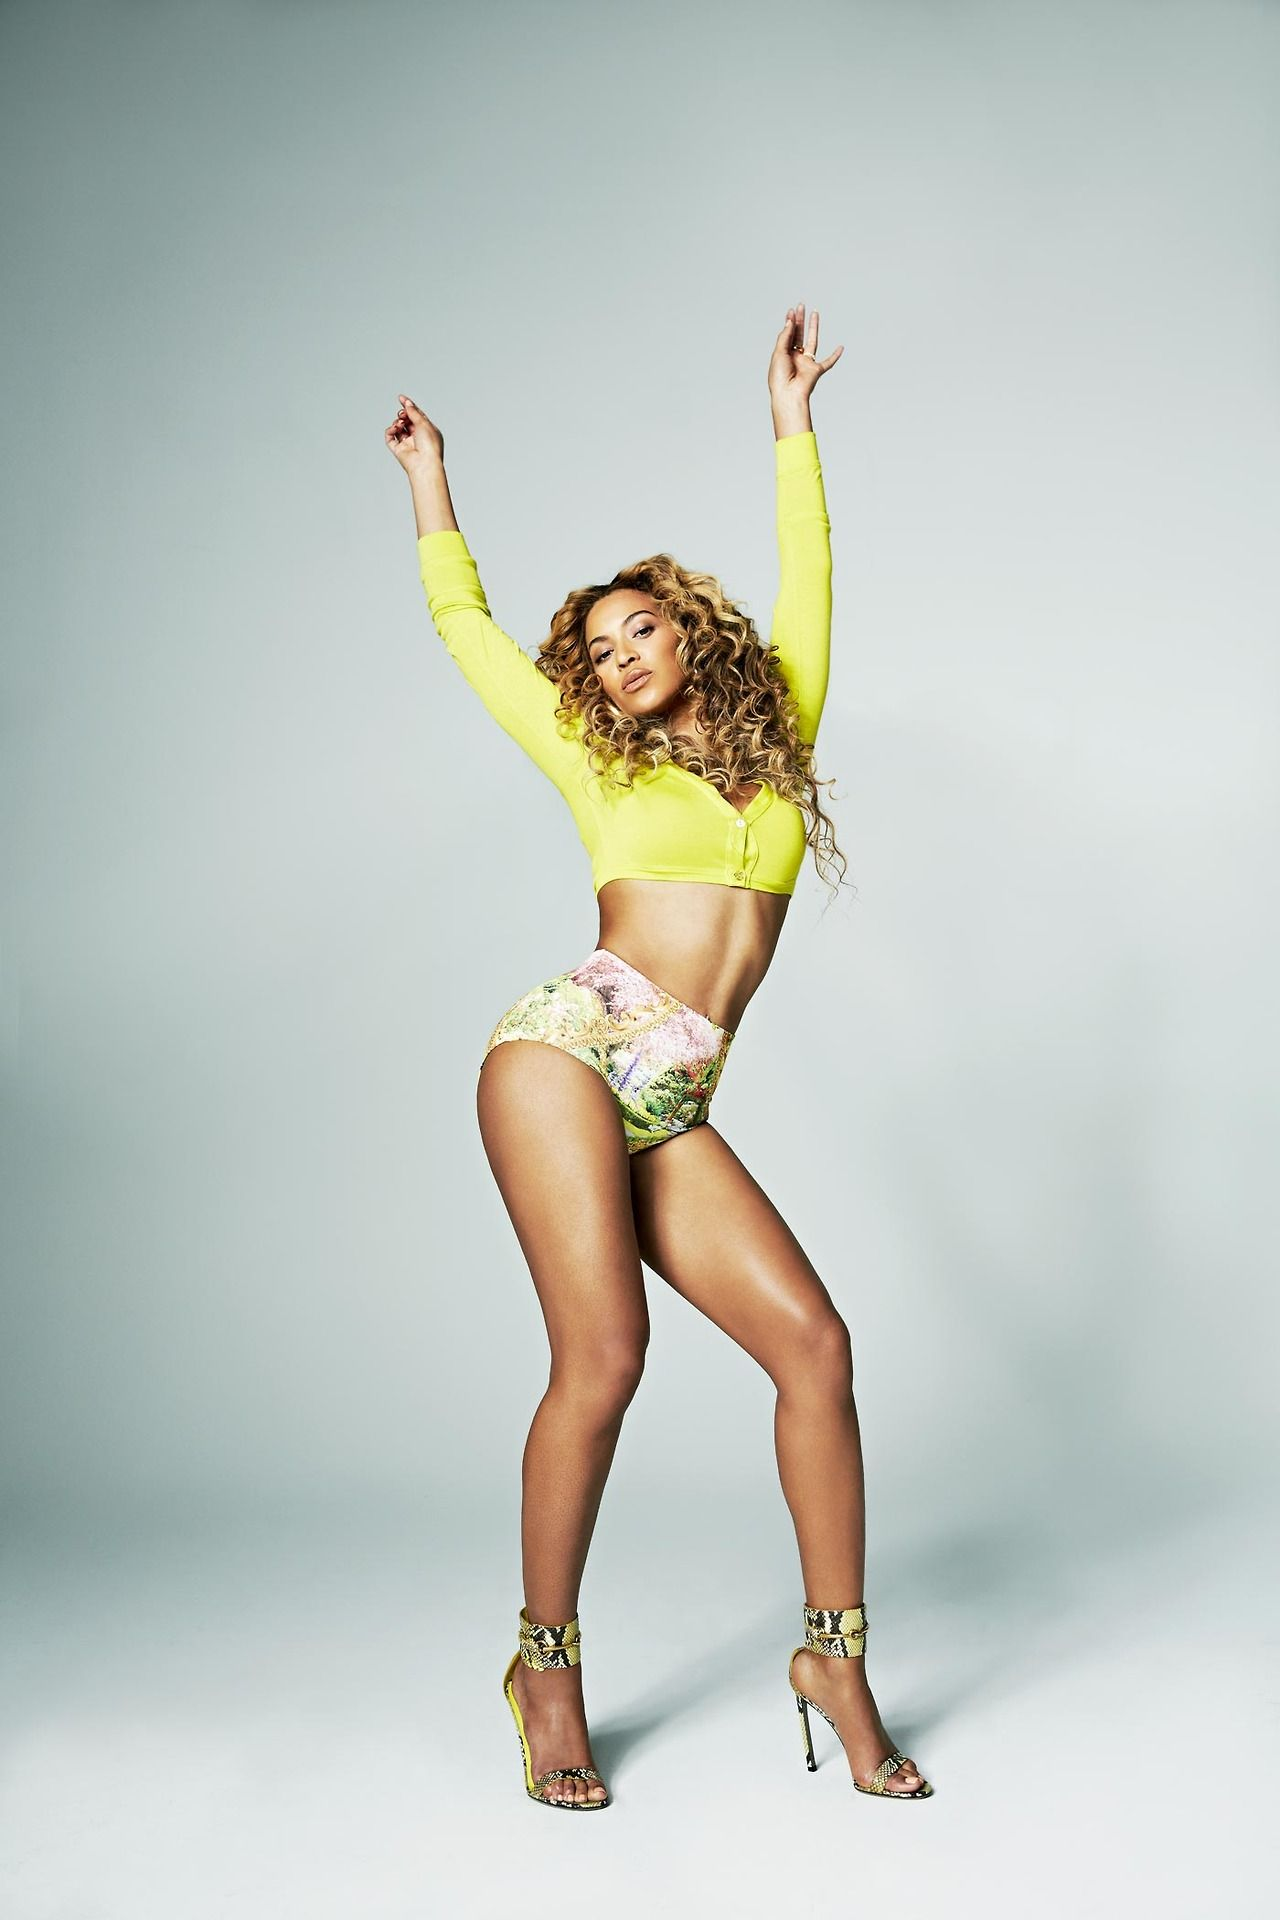 Beyoncé | I Am | Queen Bey | Pinterest | Queens, Celebs and Celebrity